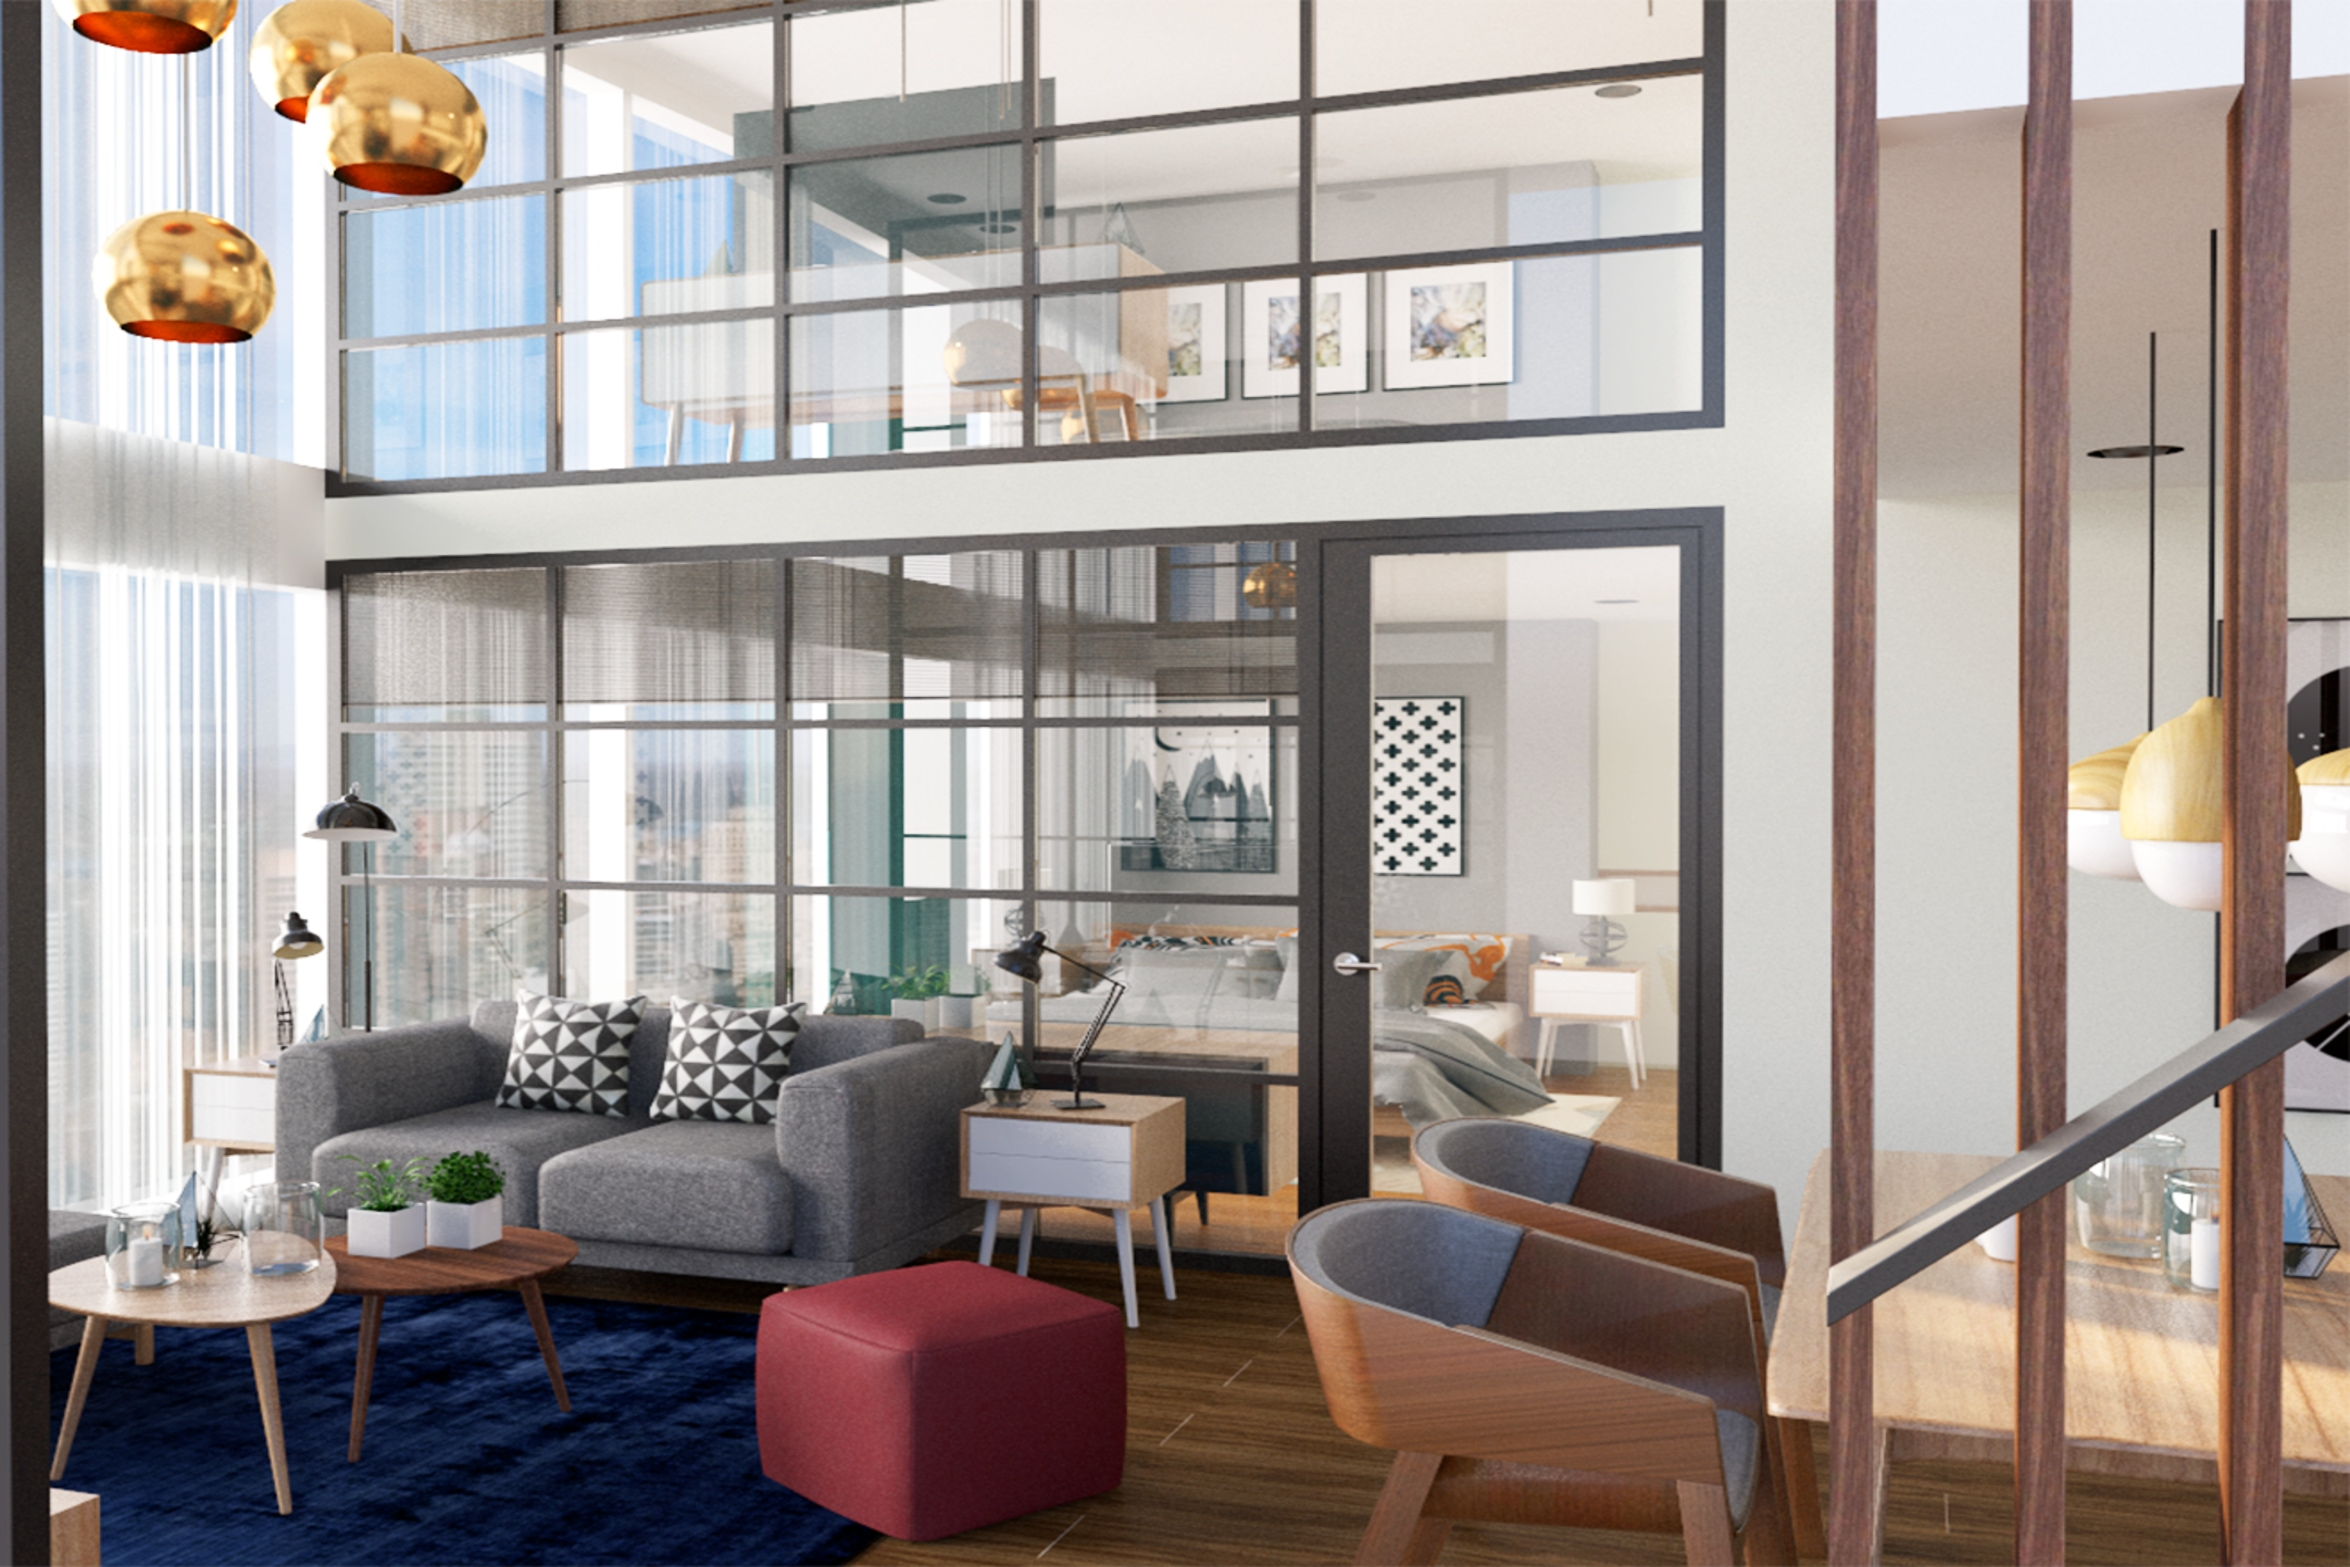 Apartement Terrace Diamond Tower, Jakarta (Proposal Design)